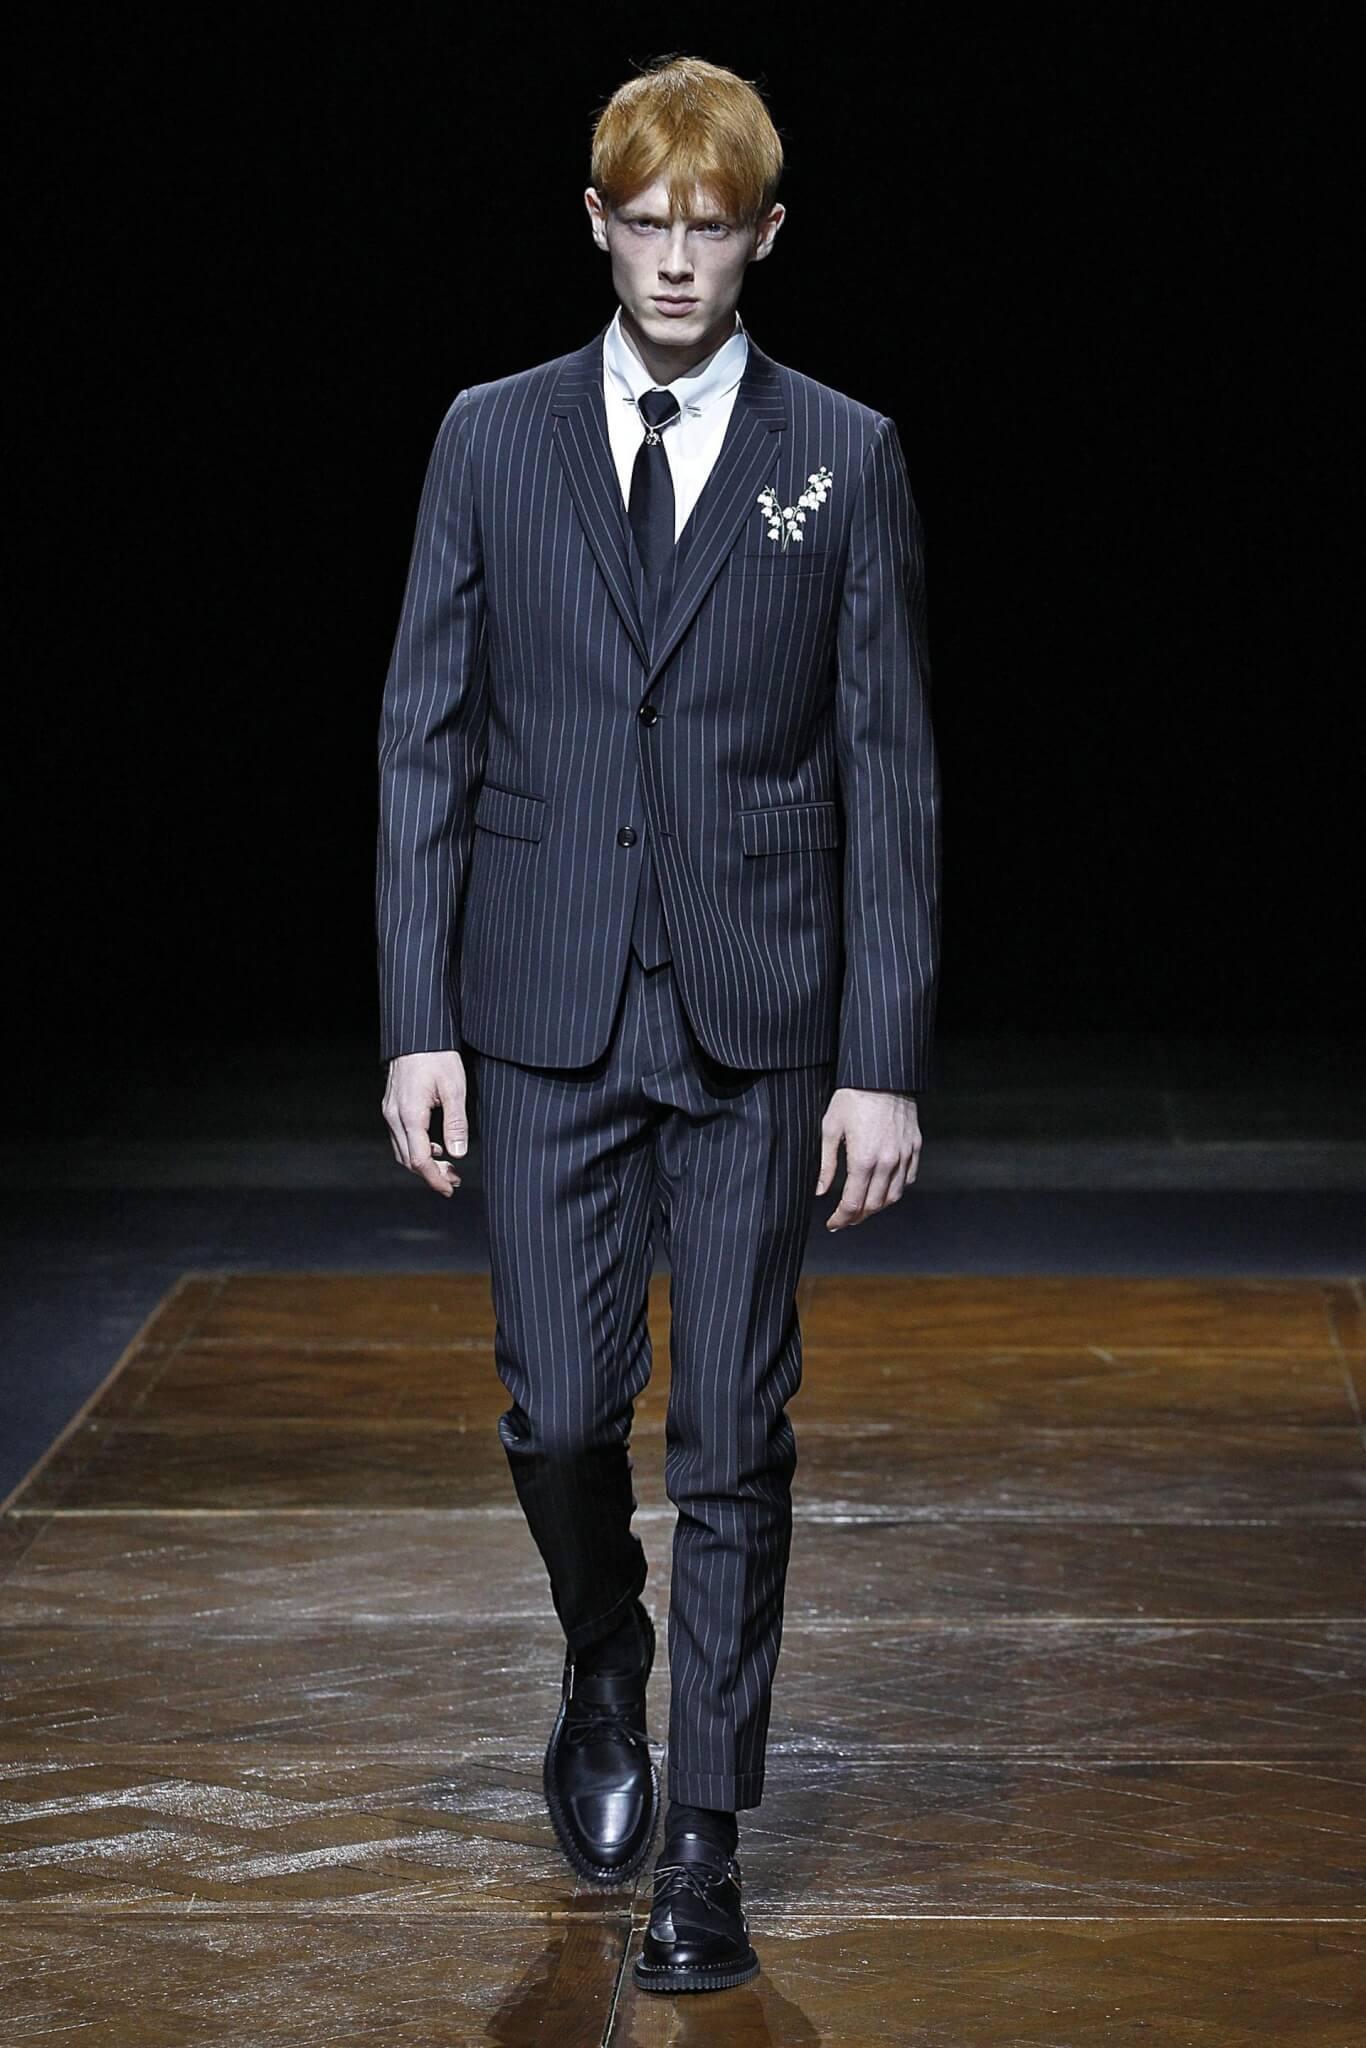 Raf Simons筆下的Dior Men西裝上,同樣有鈴蘭刺繡。